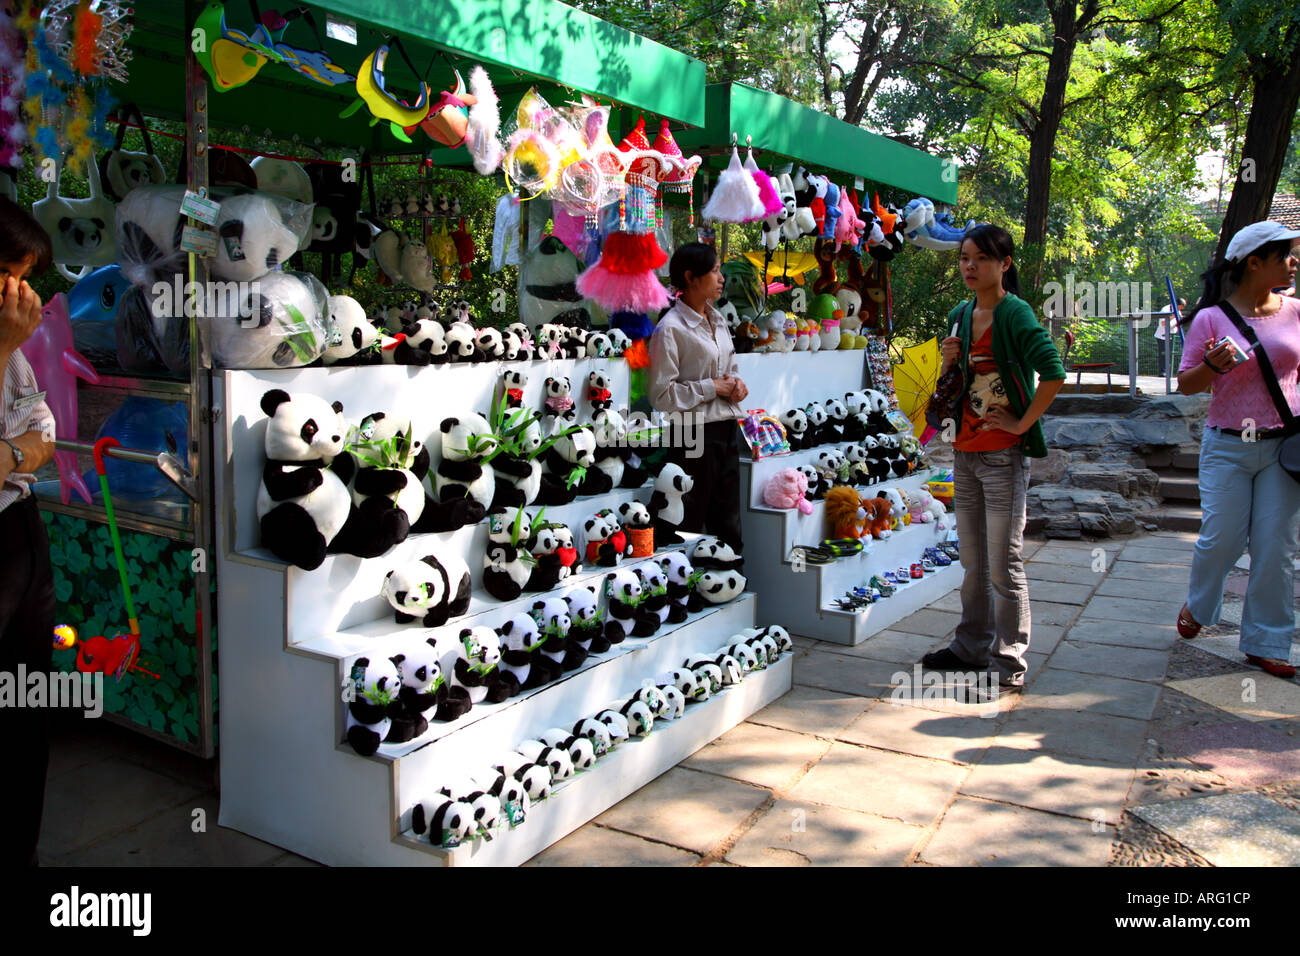 Giant Panda souvenir shop, Beijing Zoo. - Stock Image